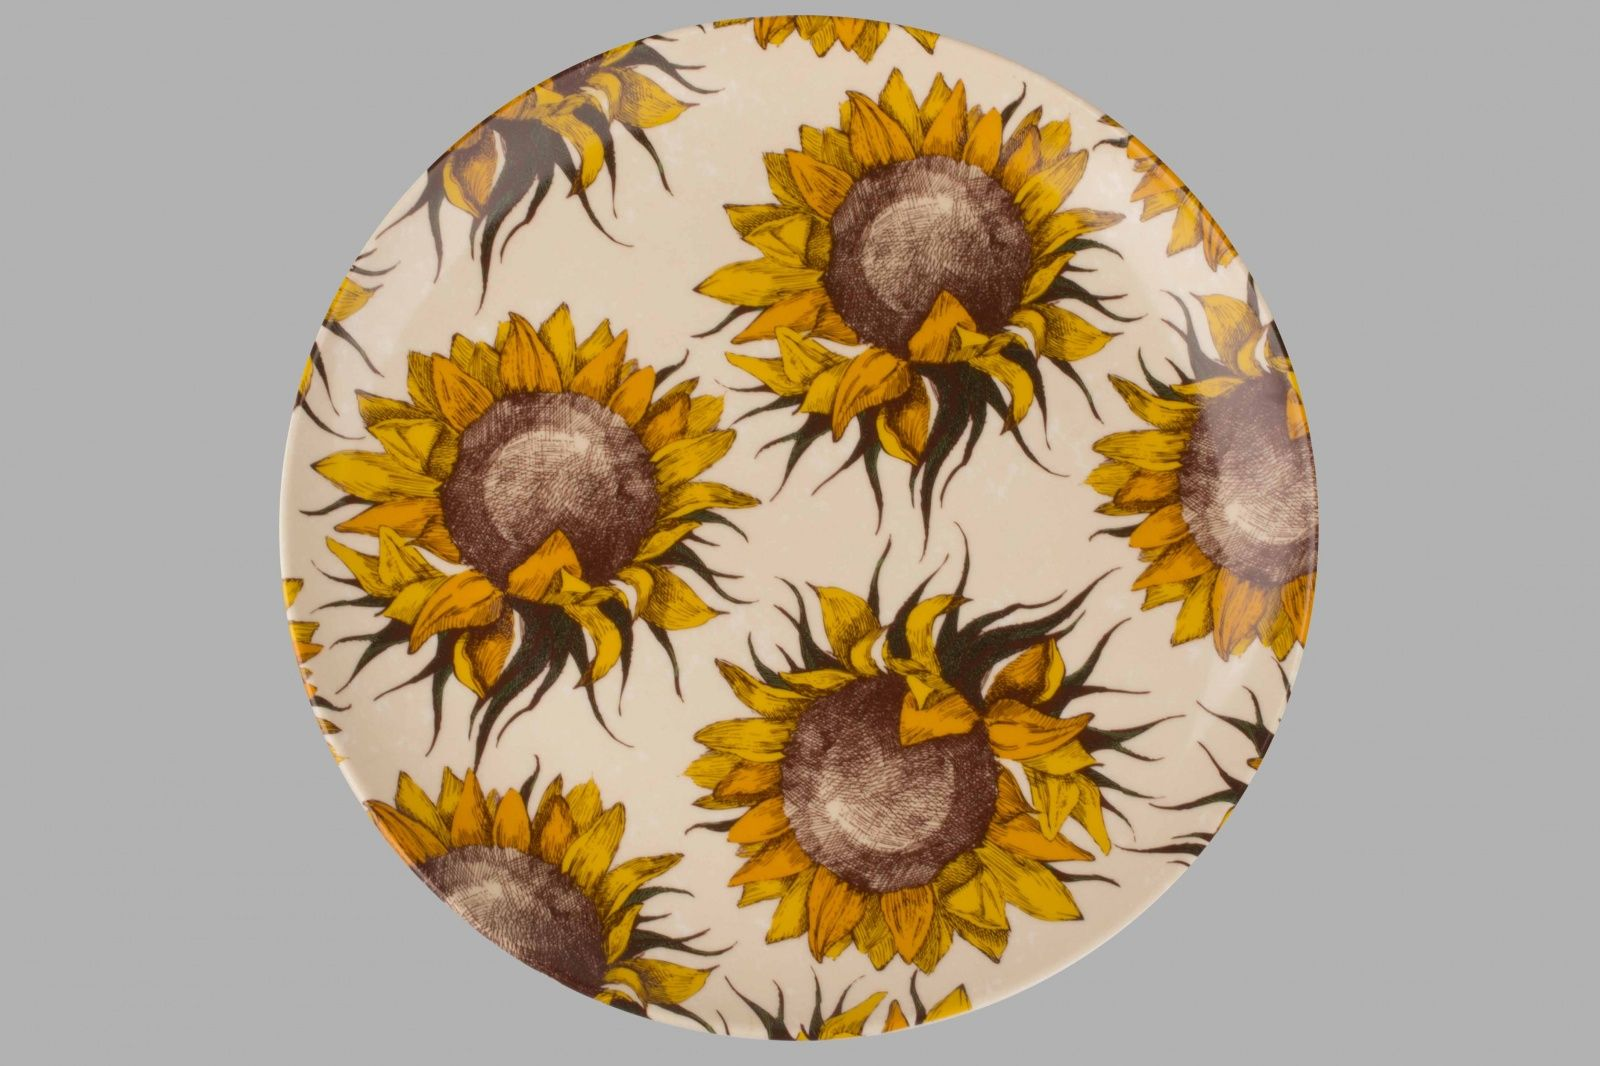 Dulevo porcelain / Plate 270 mm Sunflowers (Ceramics)